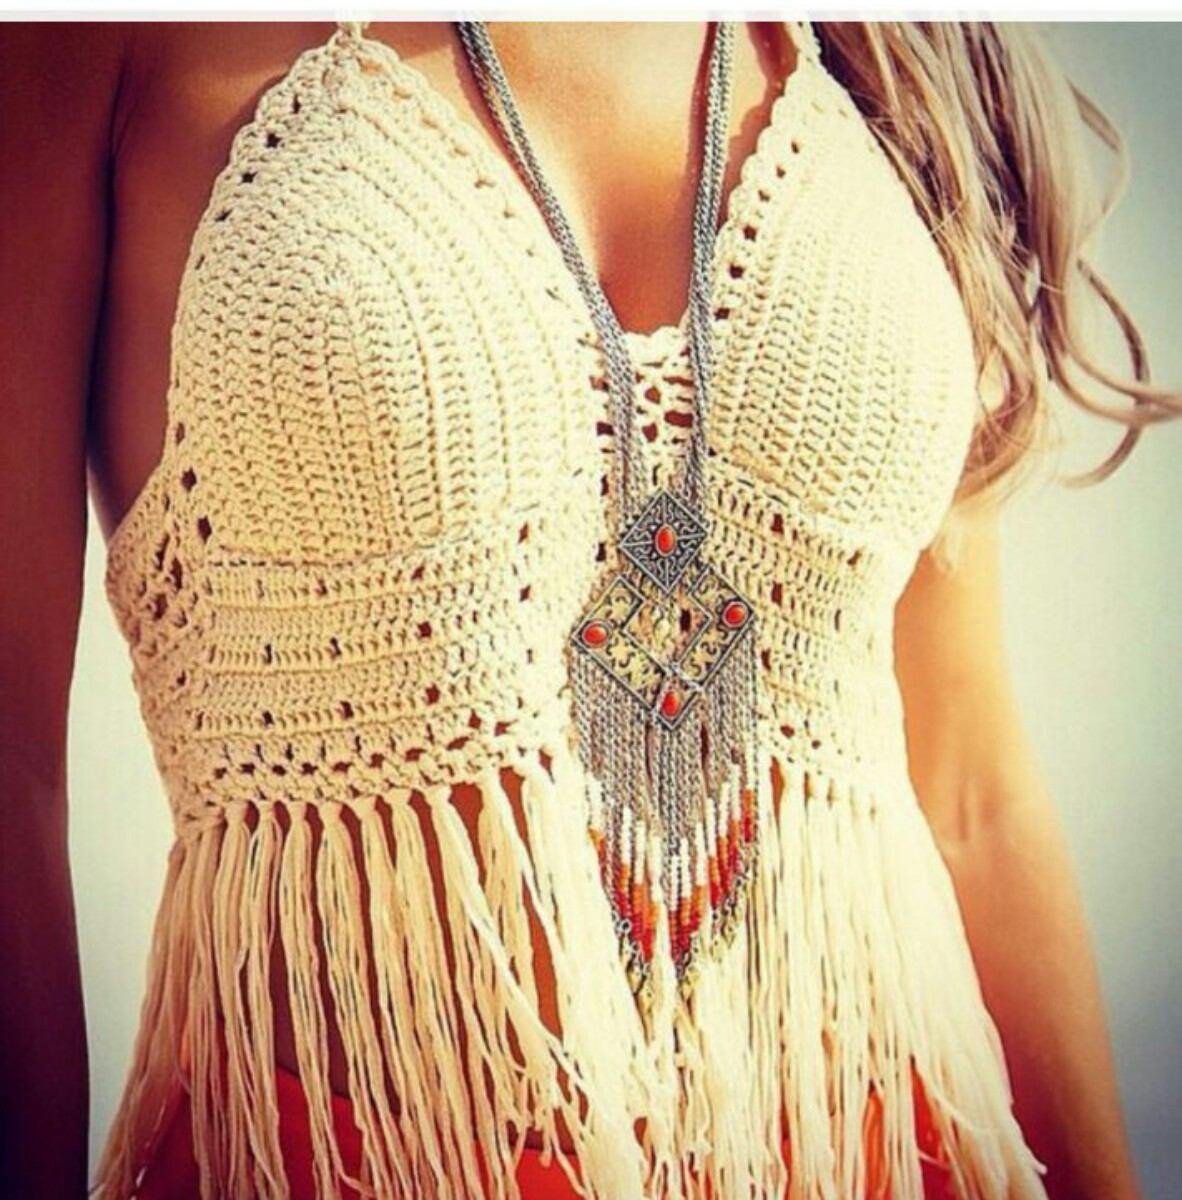 crop-top-crochet-artesanal-22916-MLA20238387087_022015-F